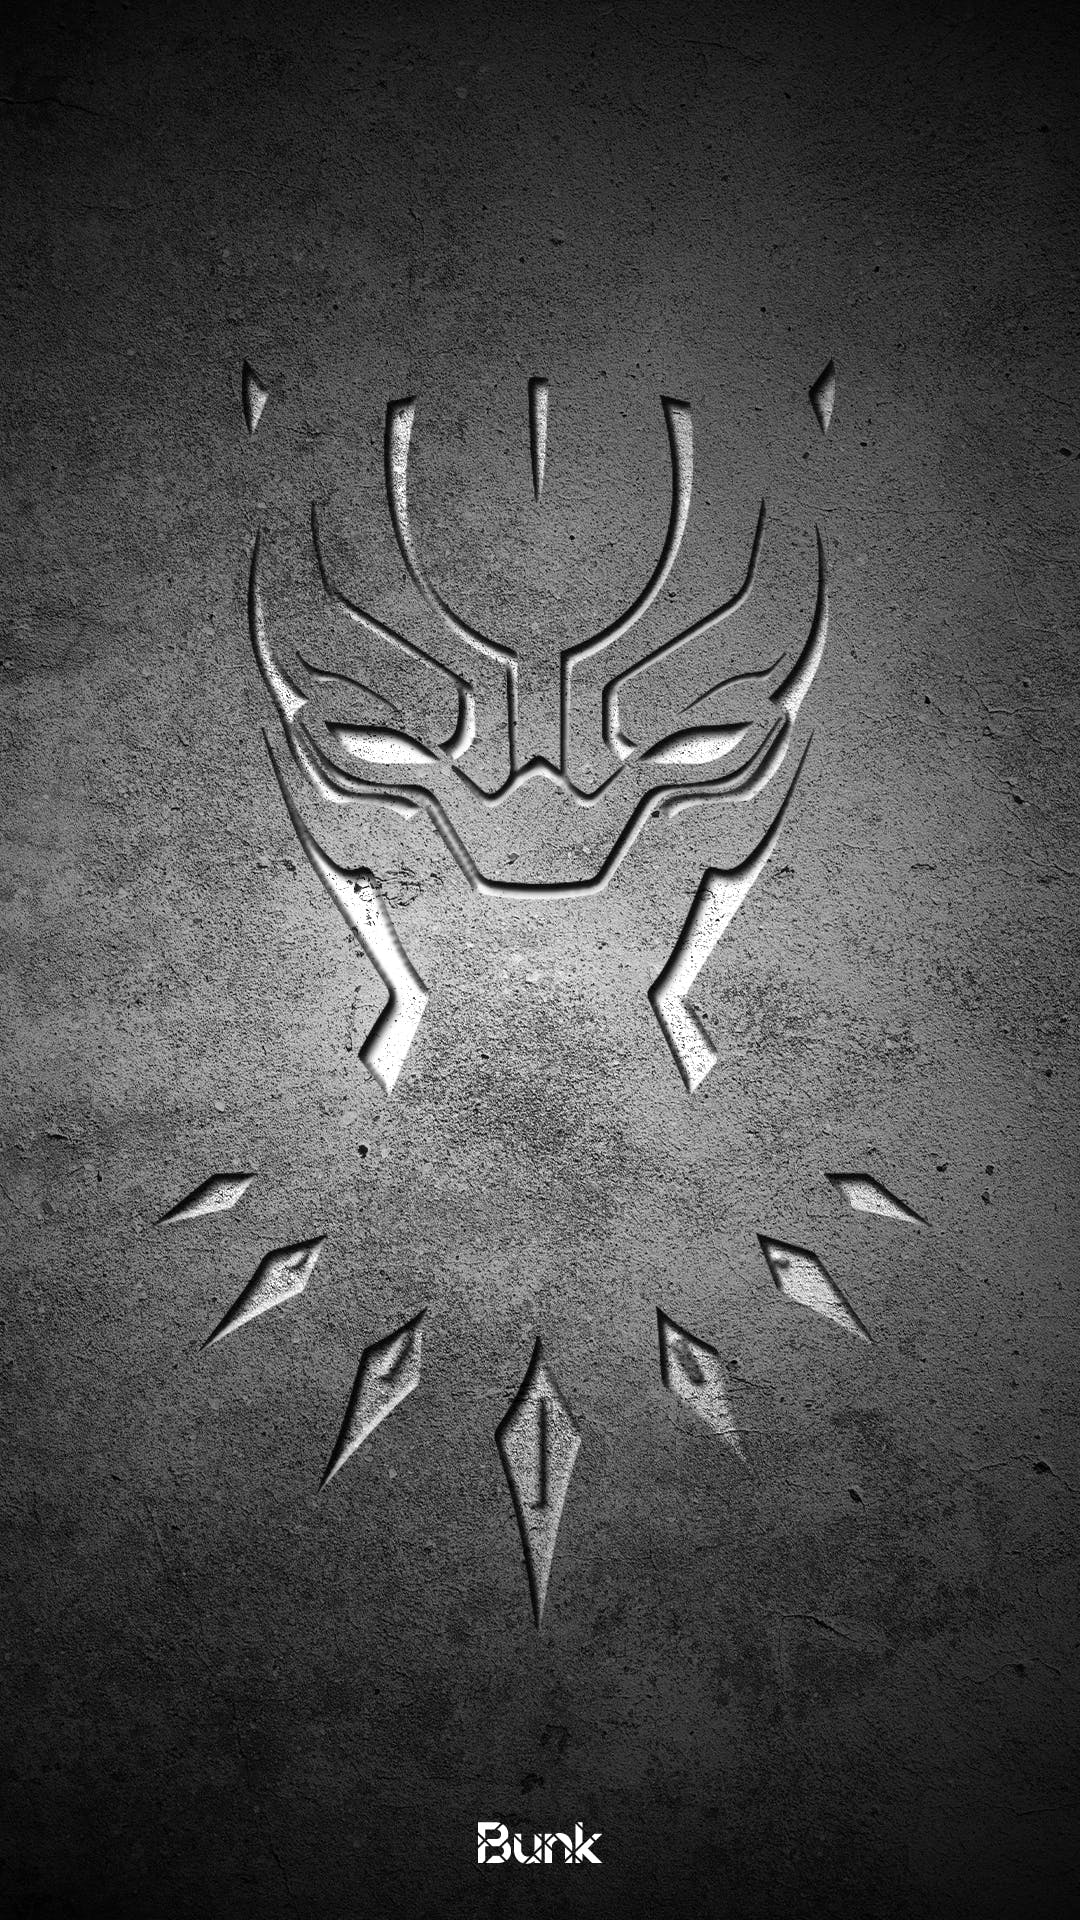 avengers, AvengersInfinityWar, blackpanther